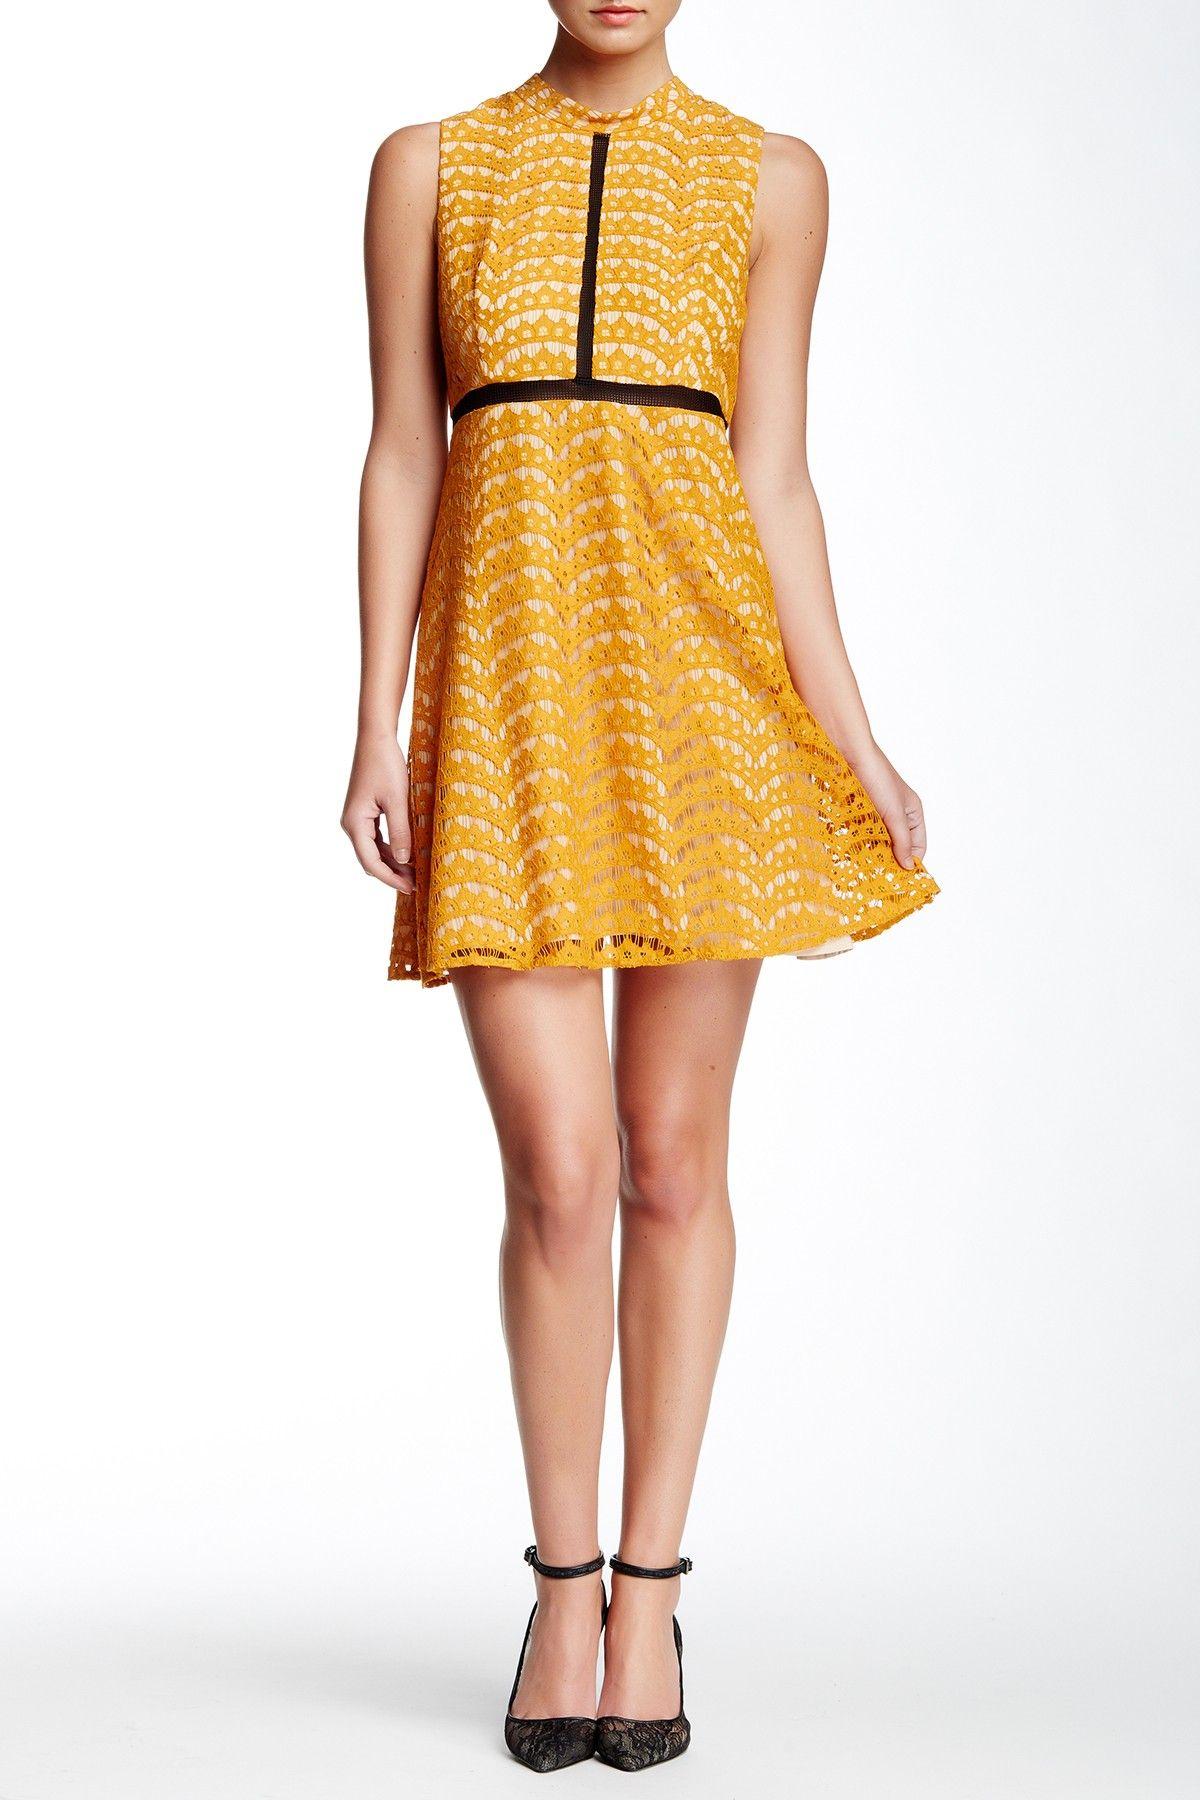 Lace Babydoll Dress by ABS by Allen Schwartz on @nordstrom_rack